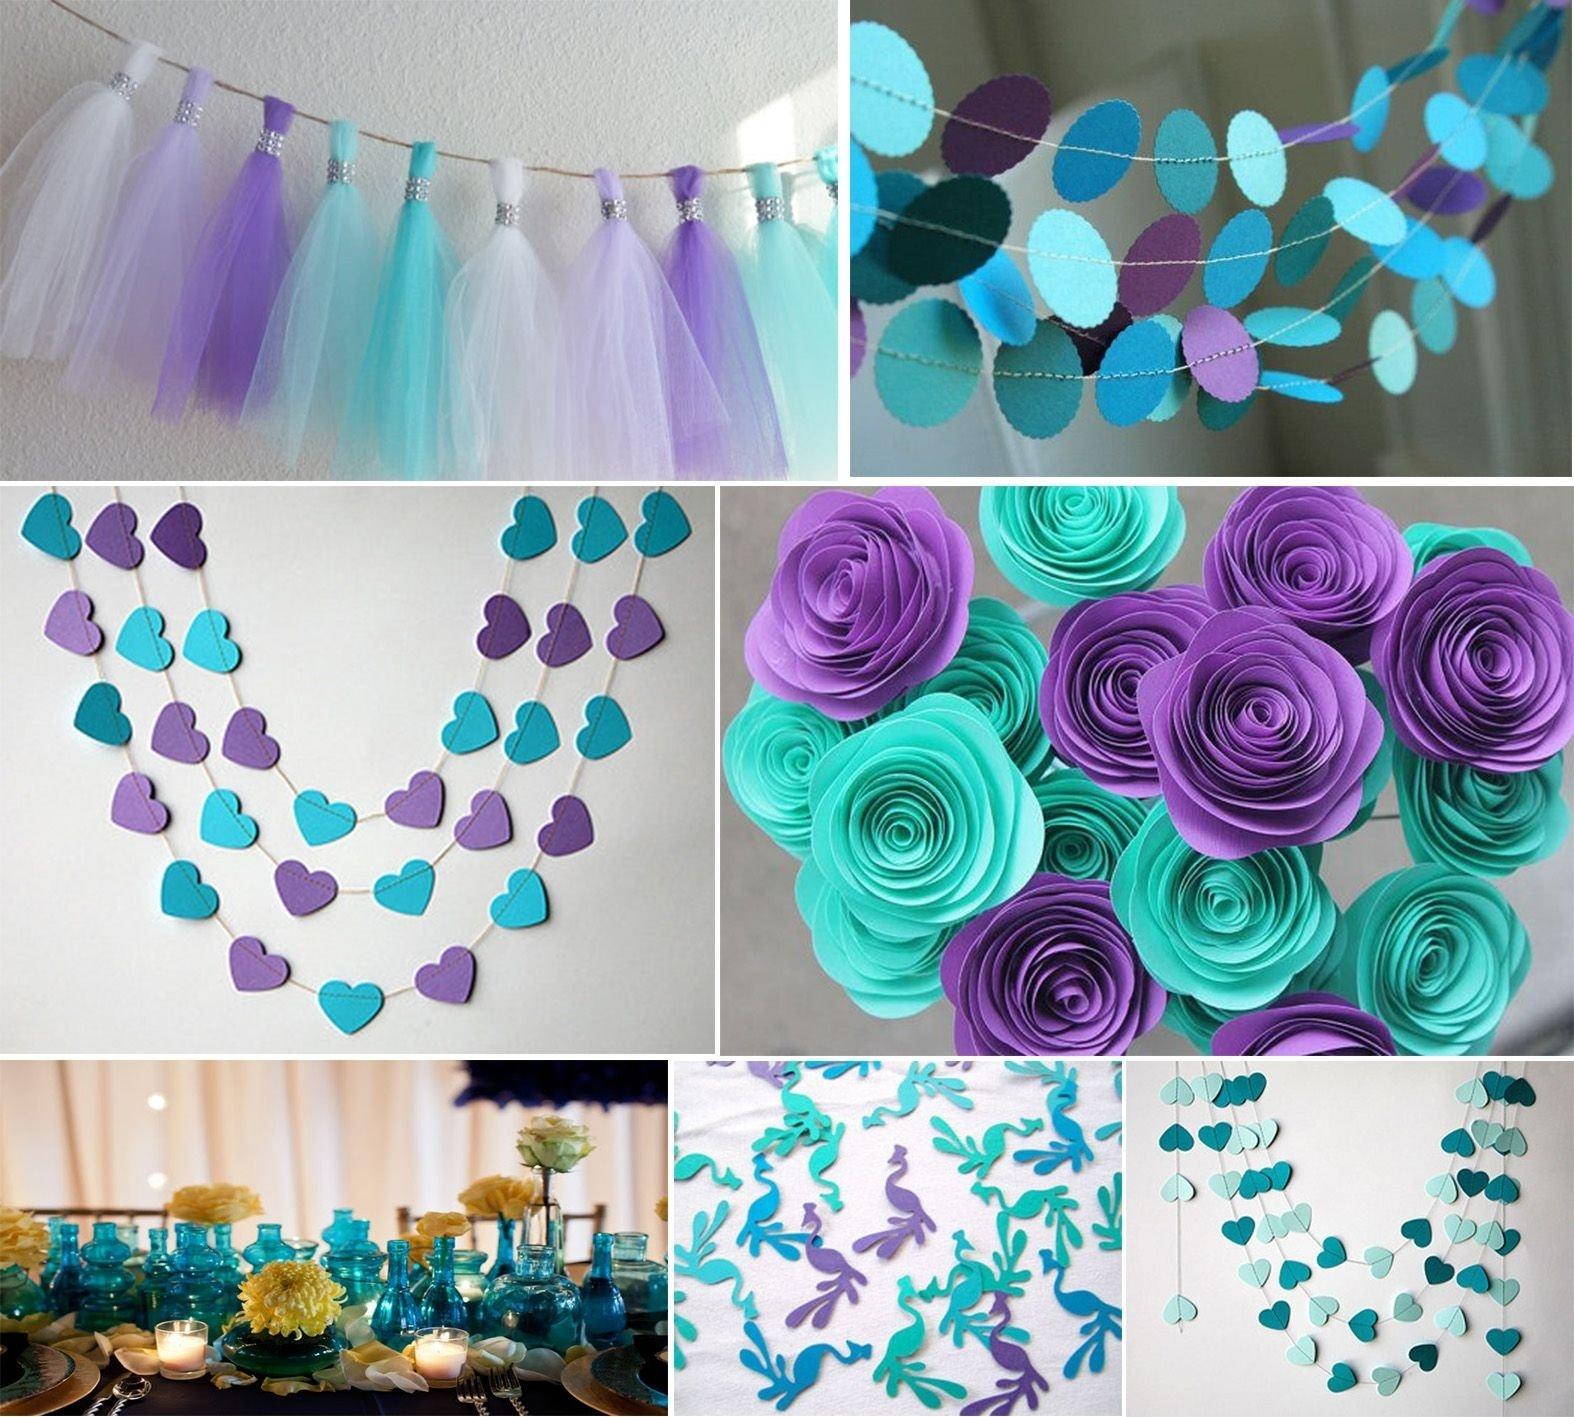 10 Pretty Teal And Purple Wedding Ideas best ideas for purple and teal wedding wedding decorations uk 2020